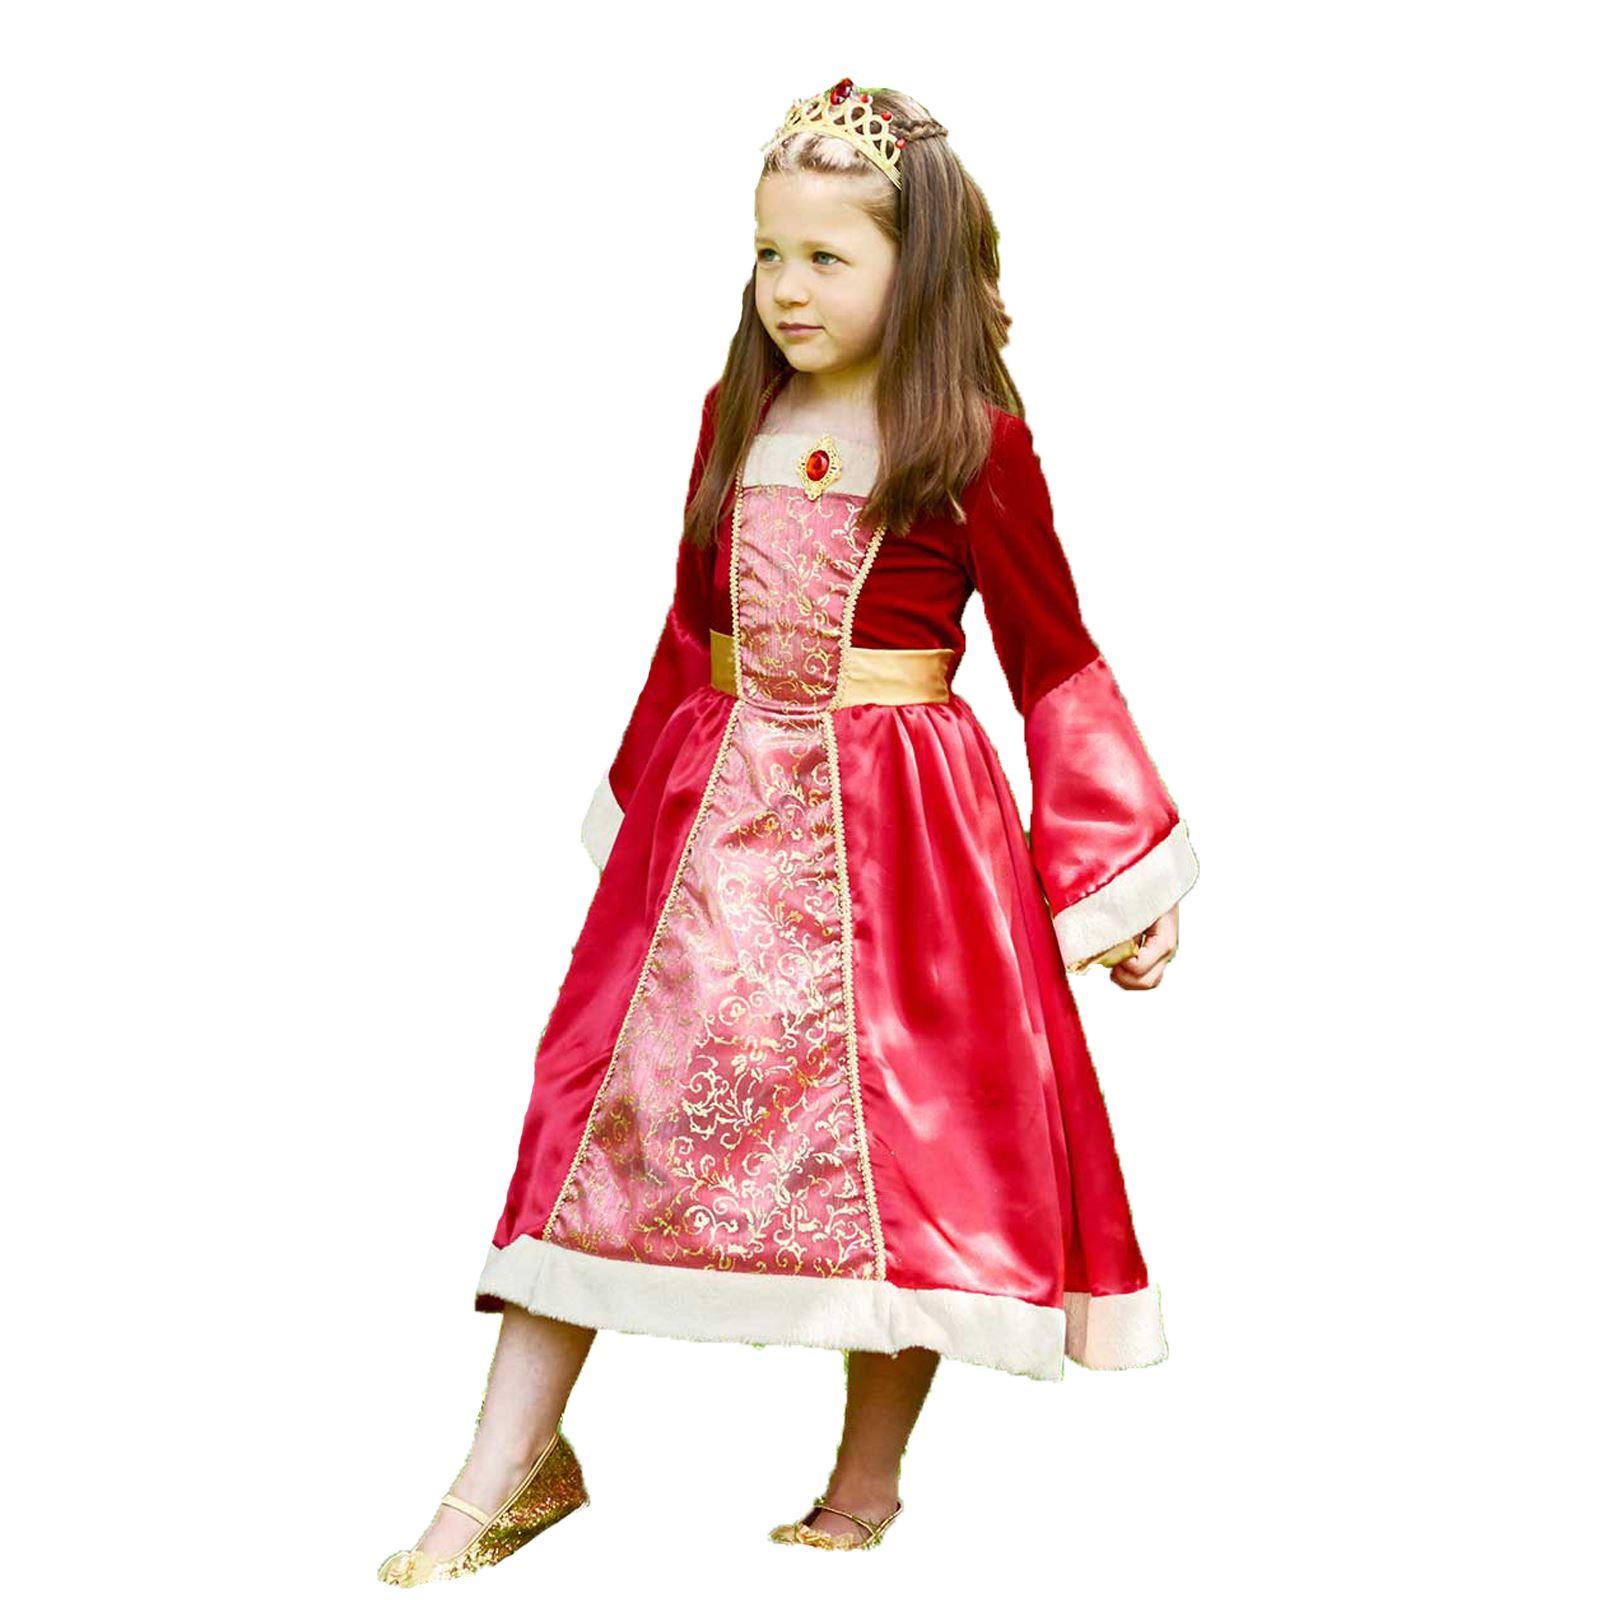 Infantil Real Princesa Medieval Reina Histórico Disfraz de personaje ...